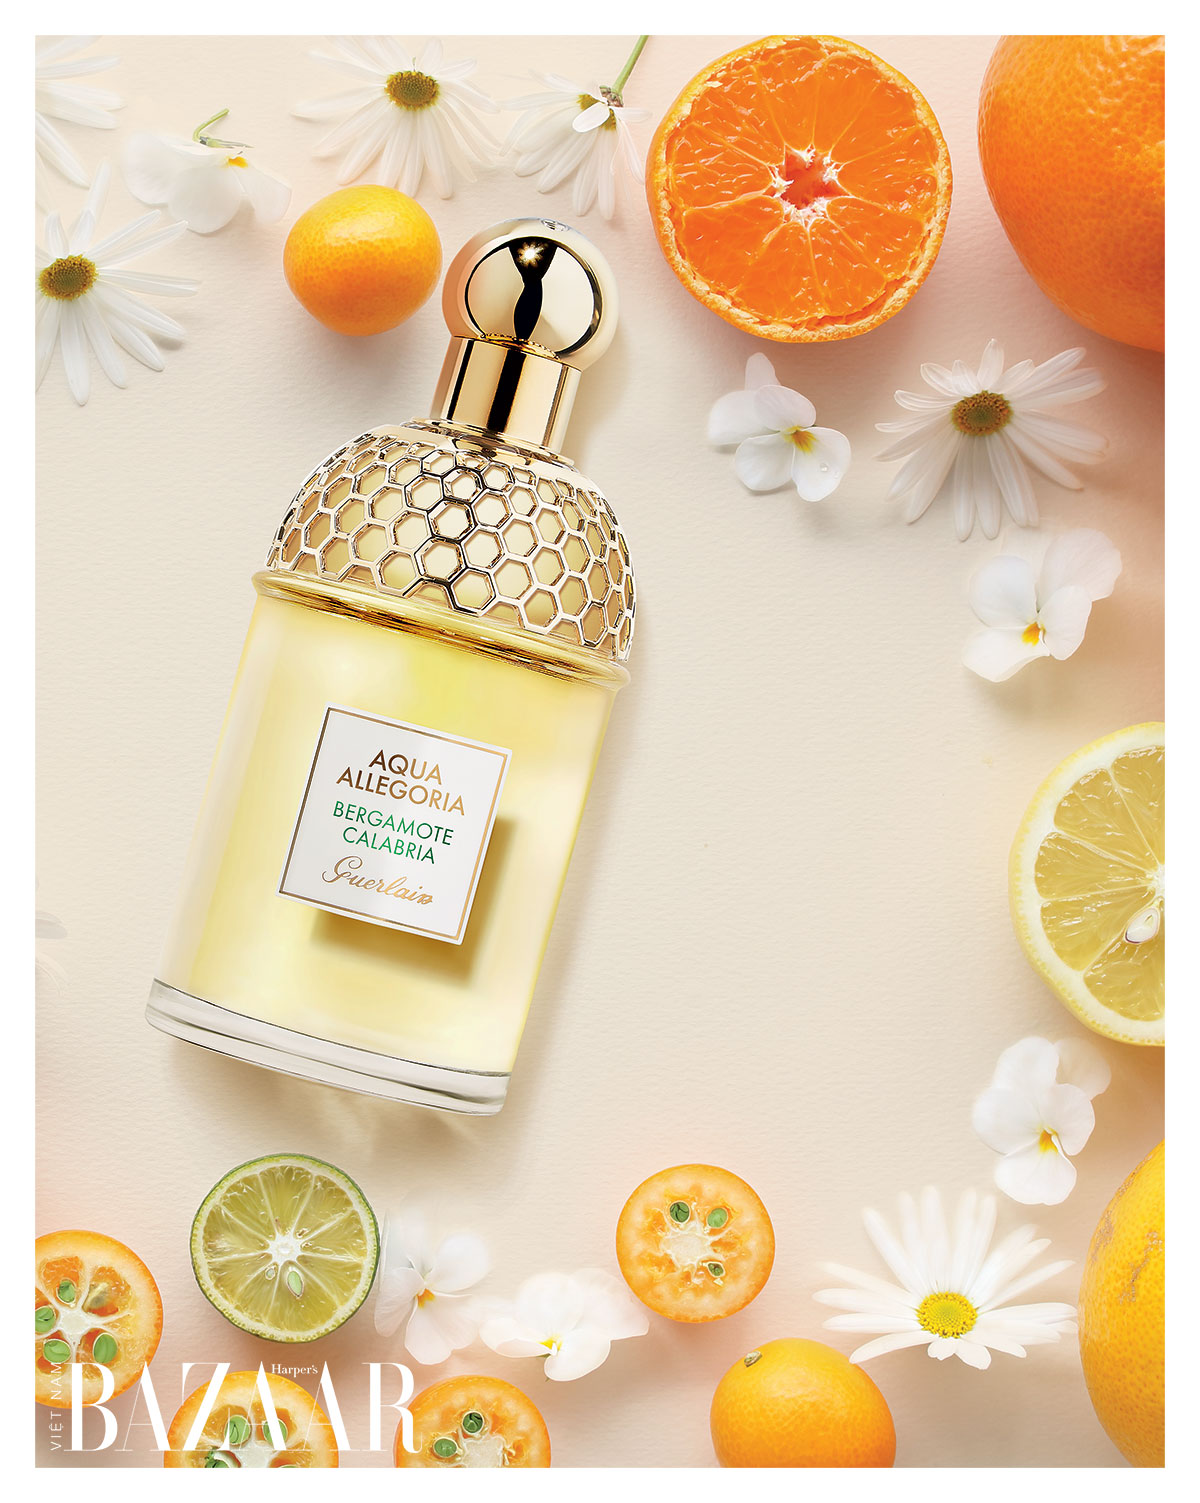 Nước hoa nữ hương trái cây: Guerlain Aqua Allegoria Bergamote Calabria